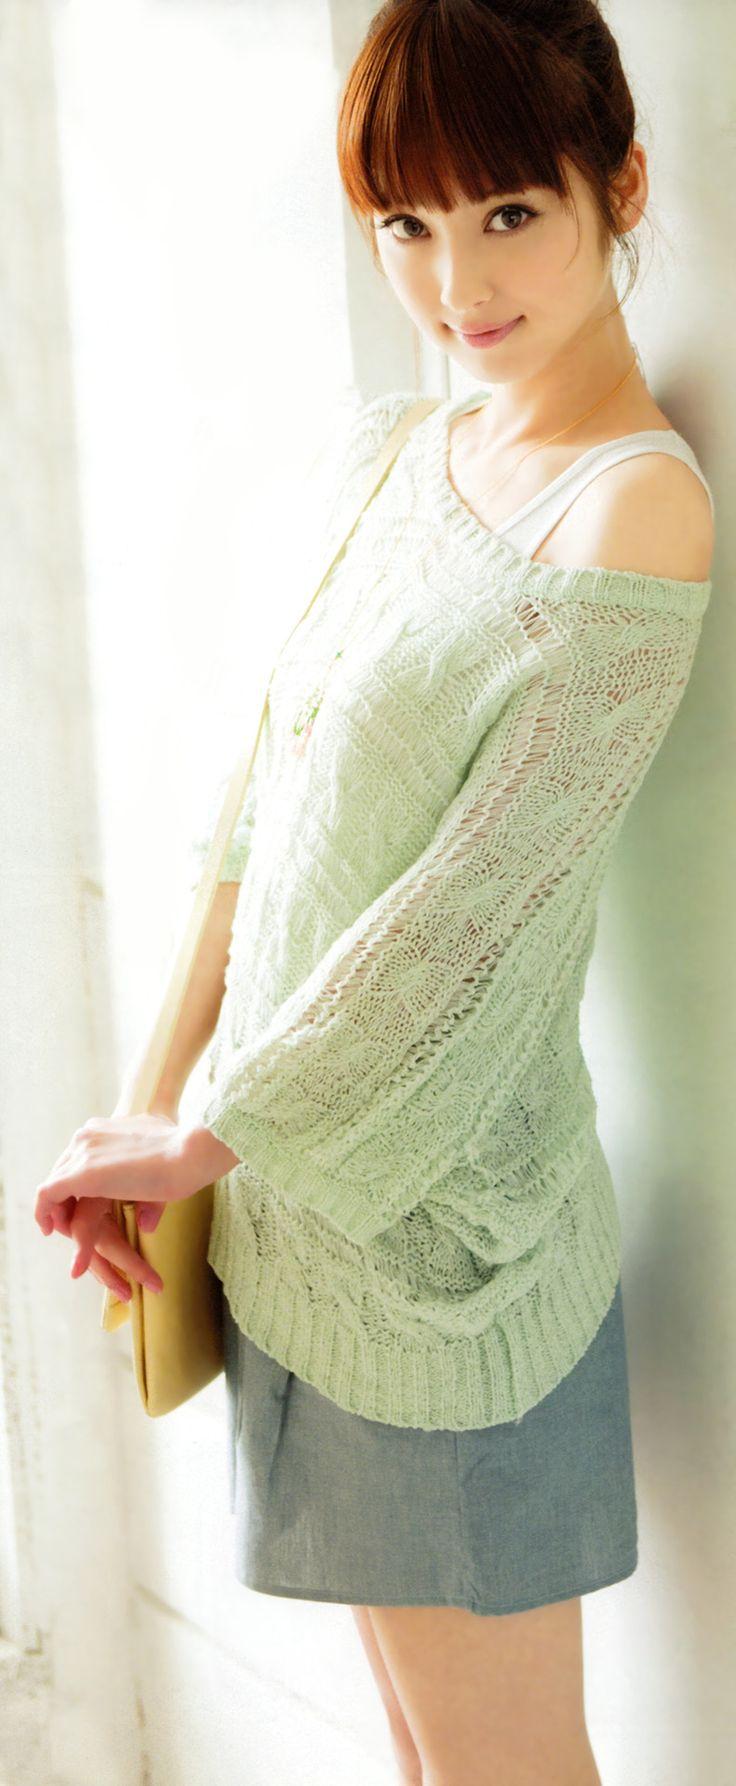 Nozomi Sasaki #Beautiful #JapaneseGirl #Asian What an Absolute angel.....